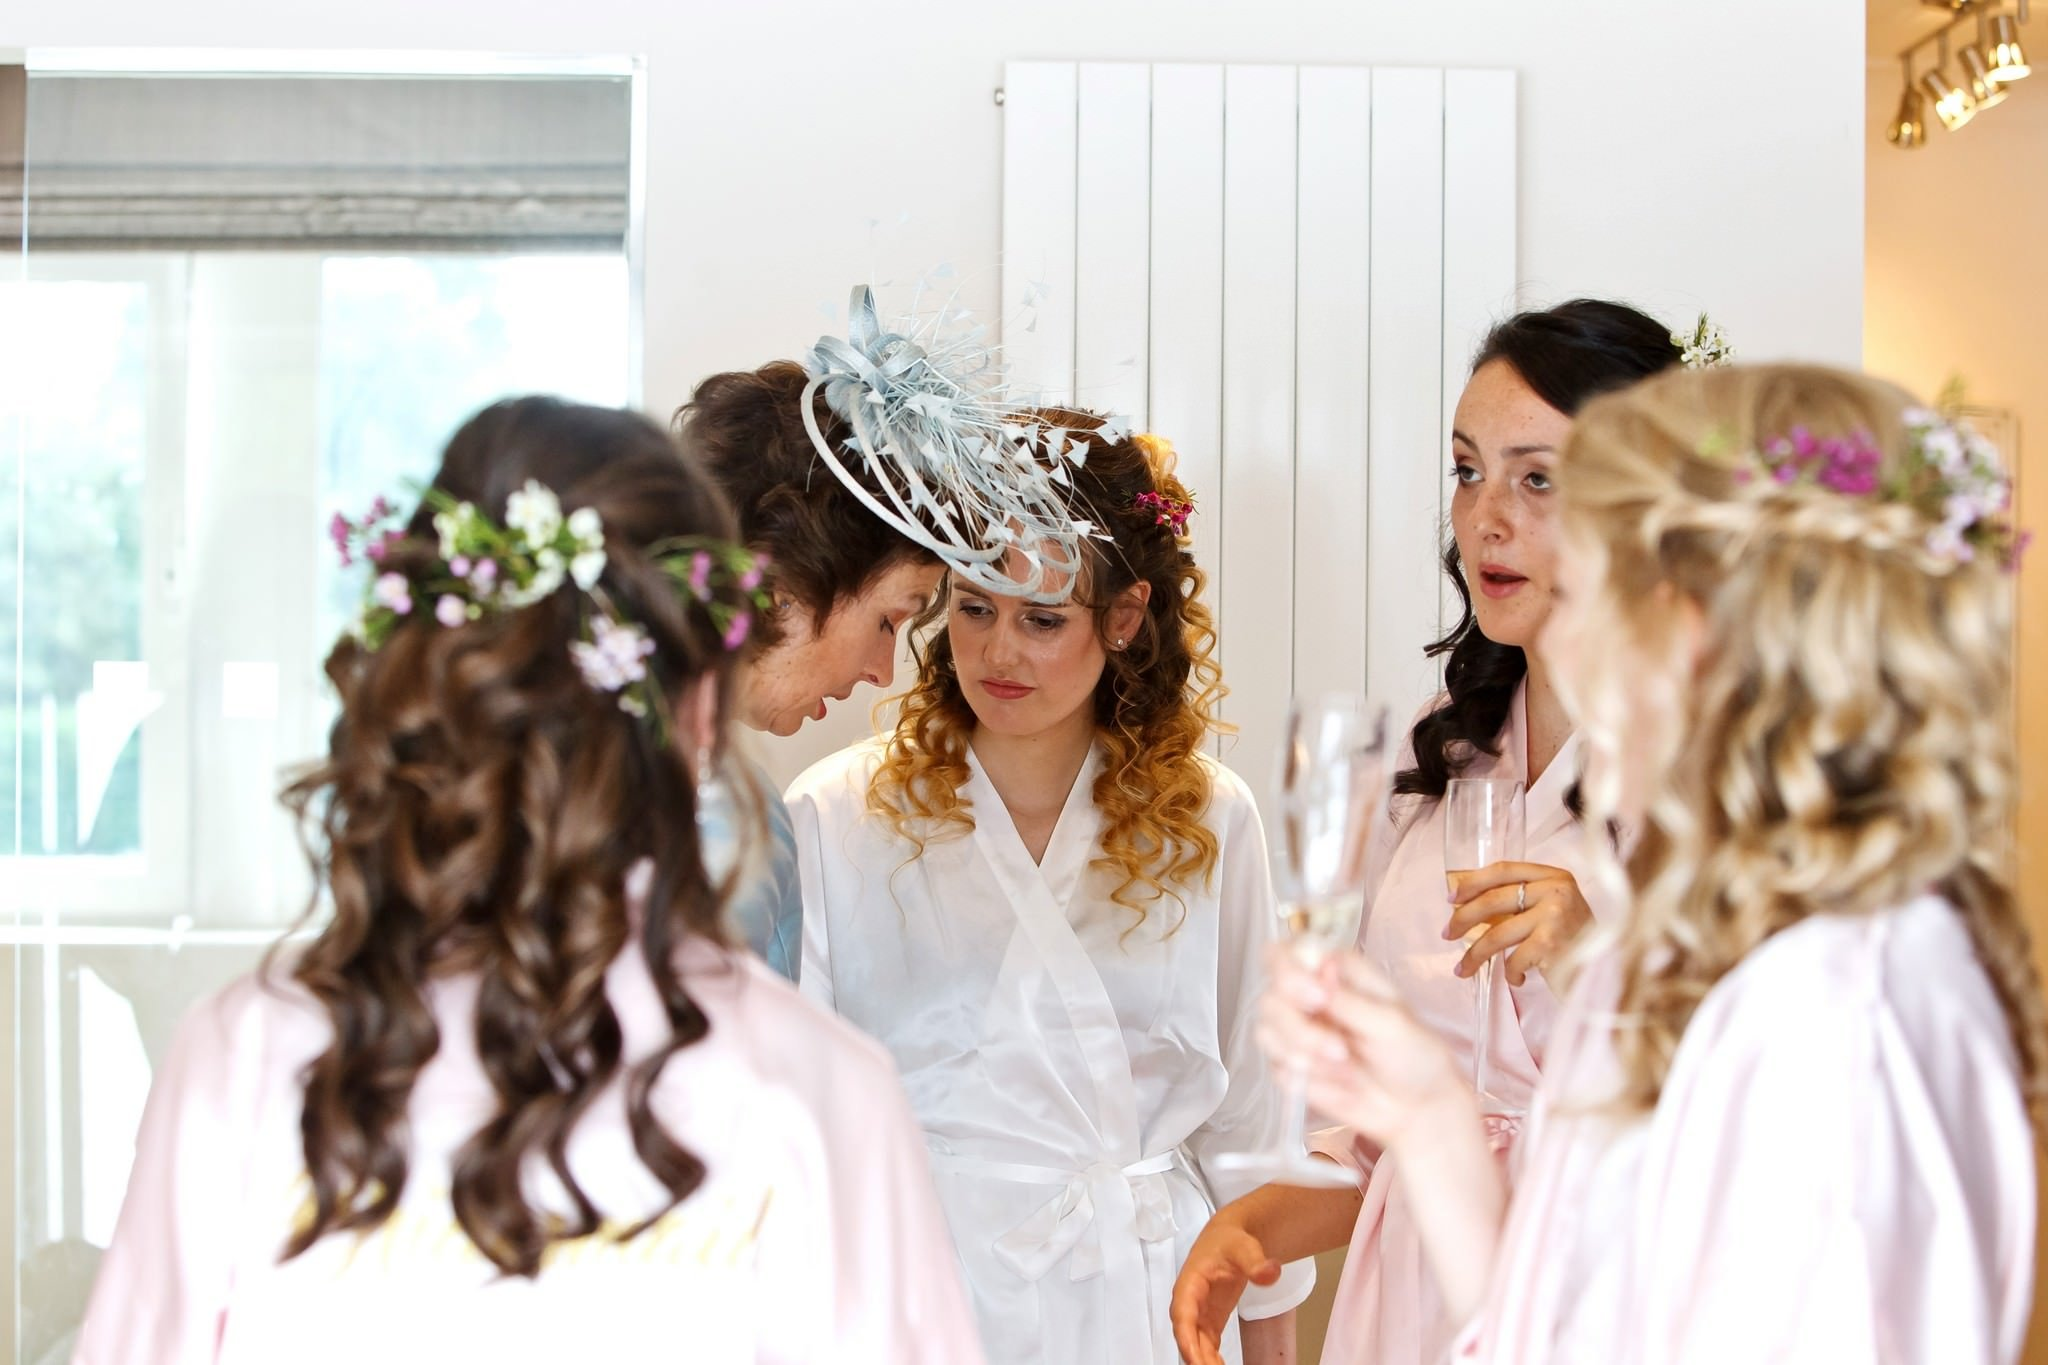 Itchenor Marquee Wedding